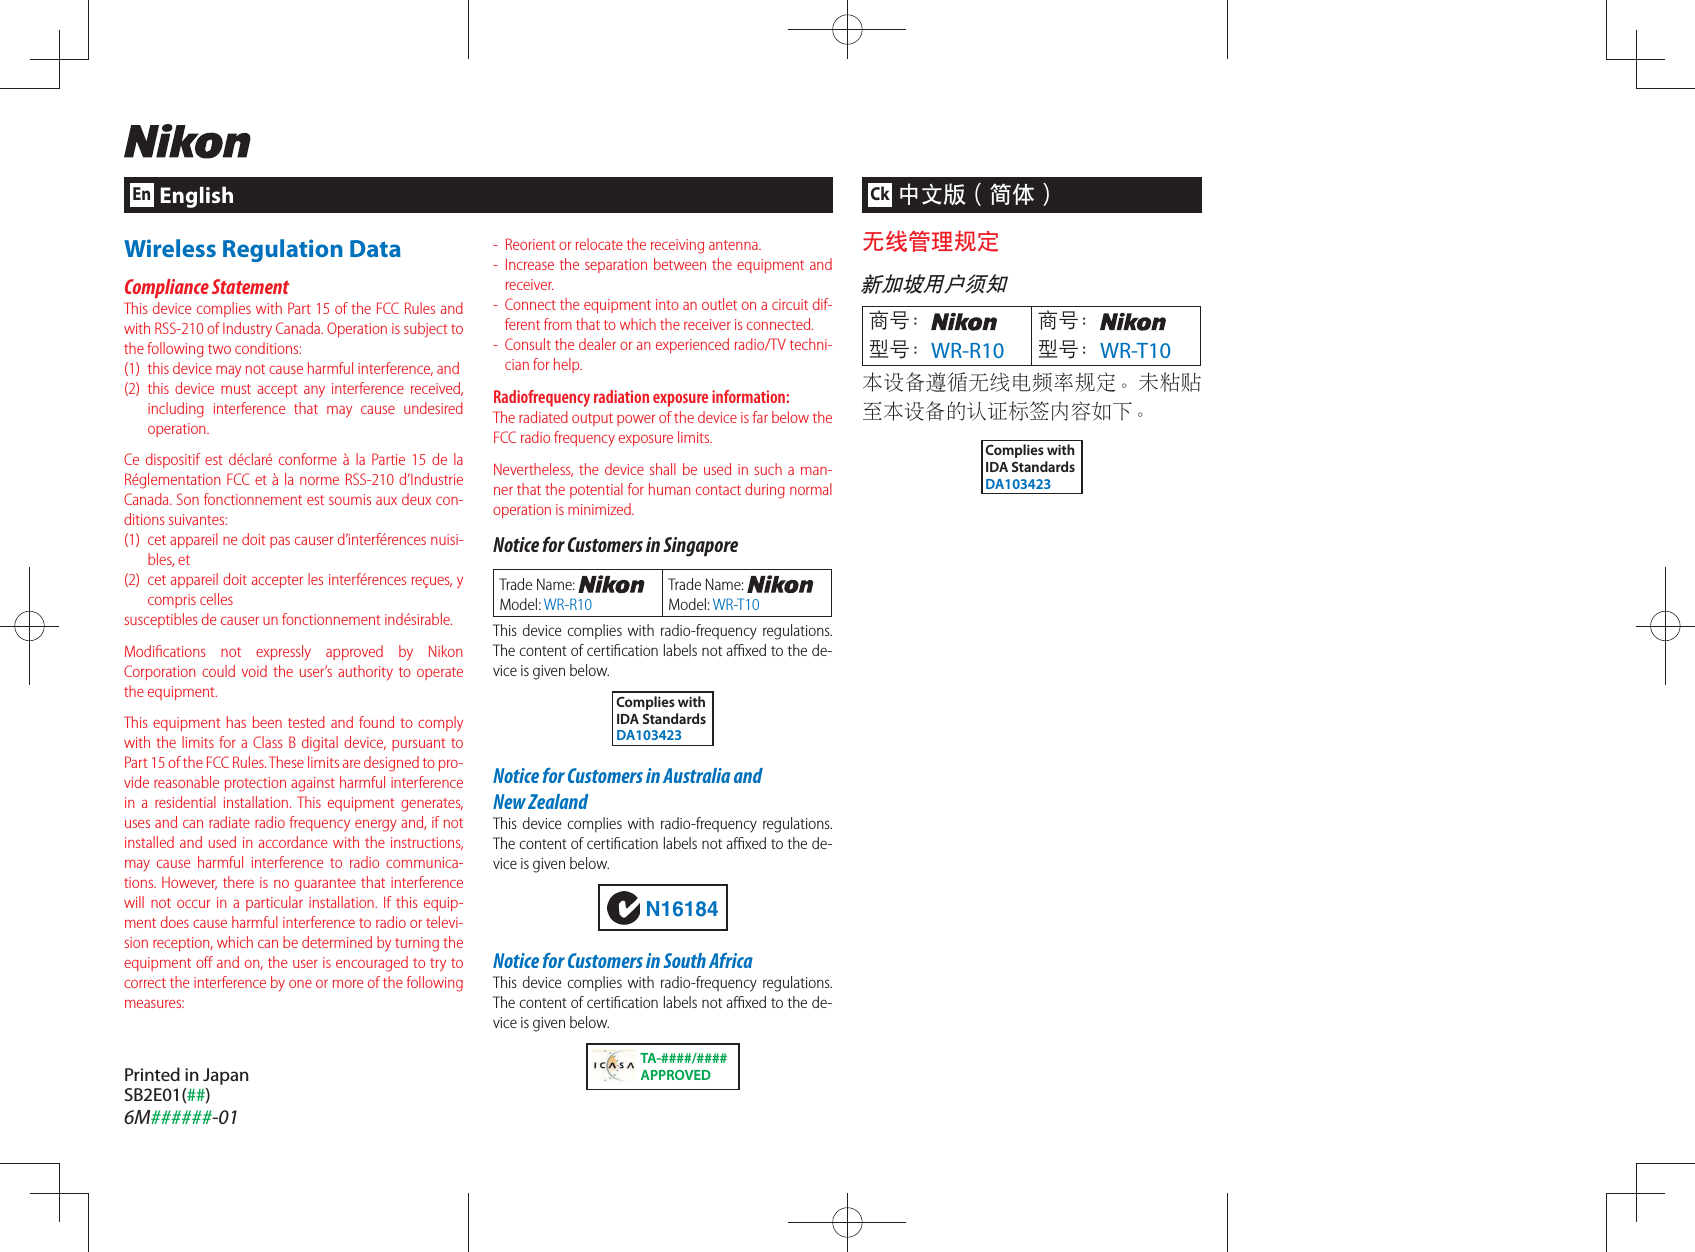 Nikon 2149EA Remote Control Device User Manual H1105 06 Regulations